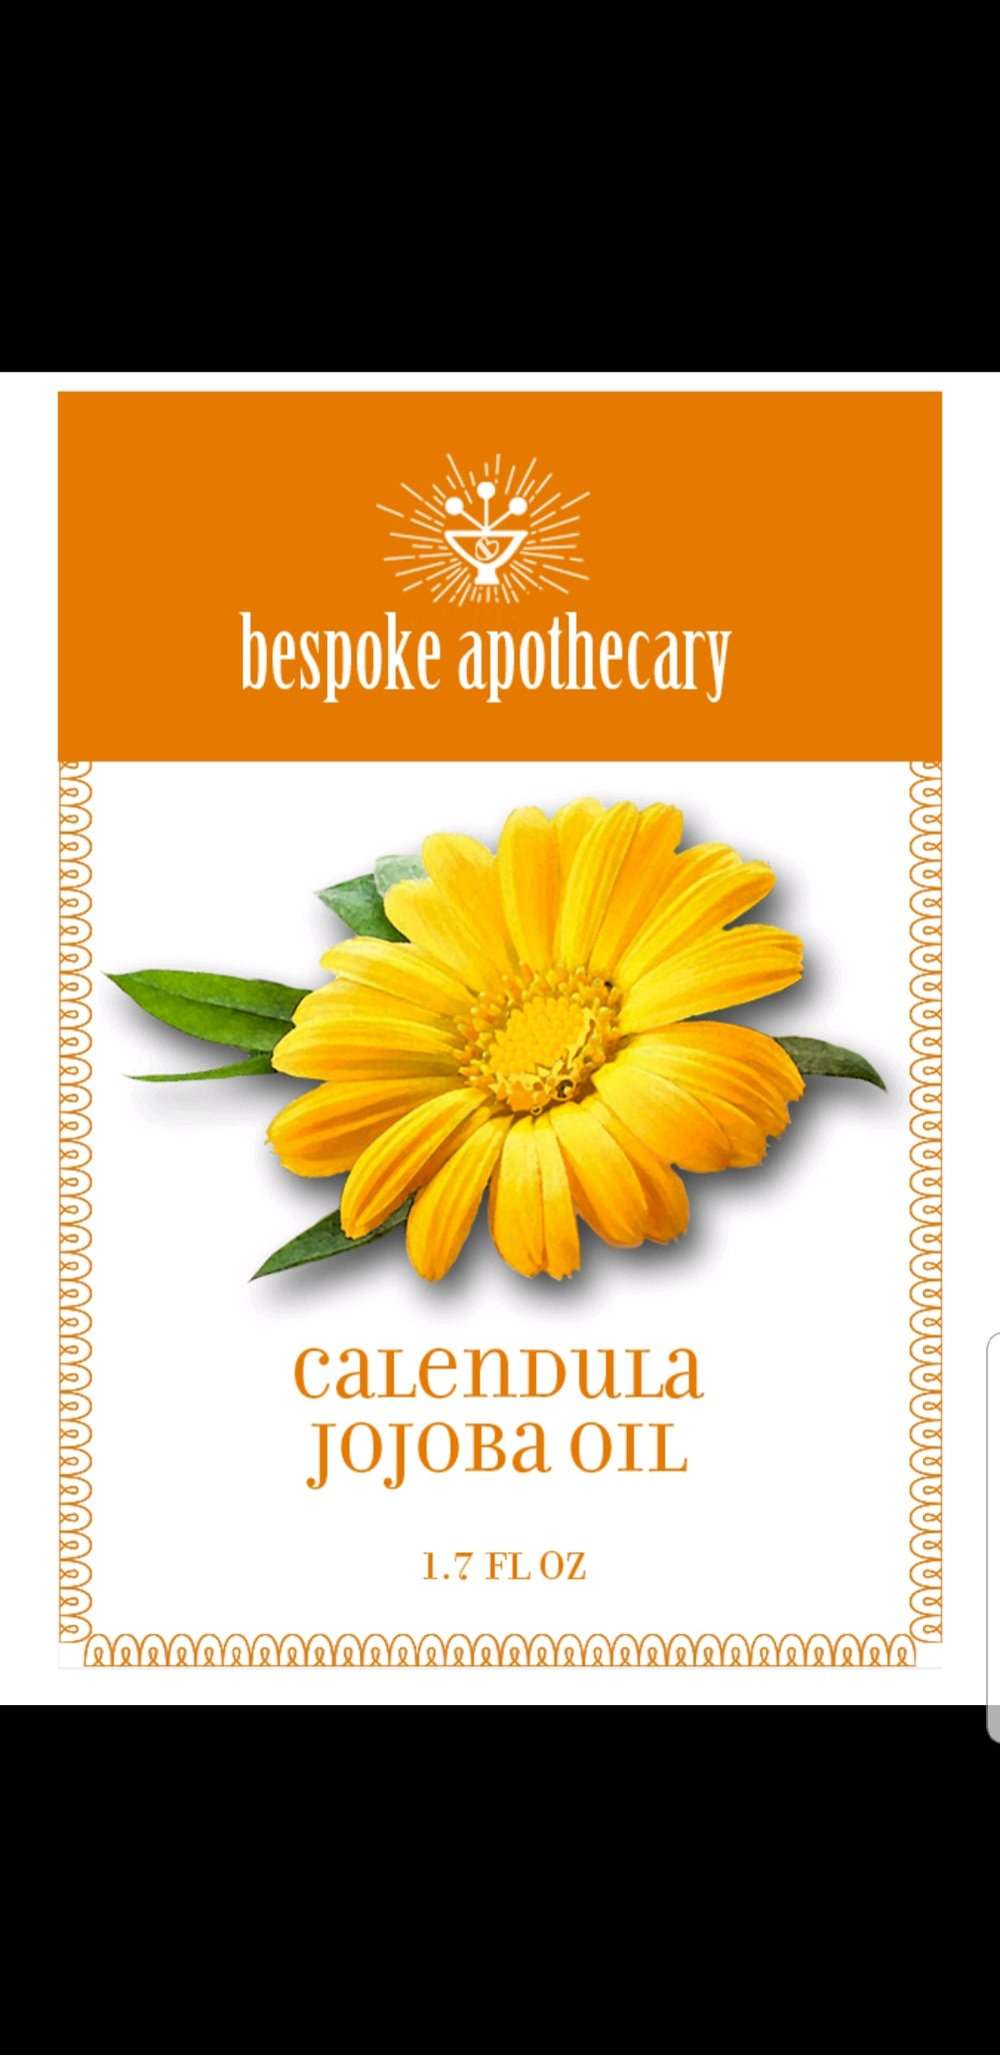 2 oz. DDF-grown Organic Calendula with Jojoba oil